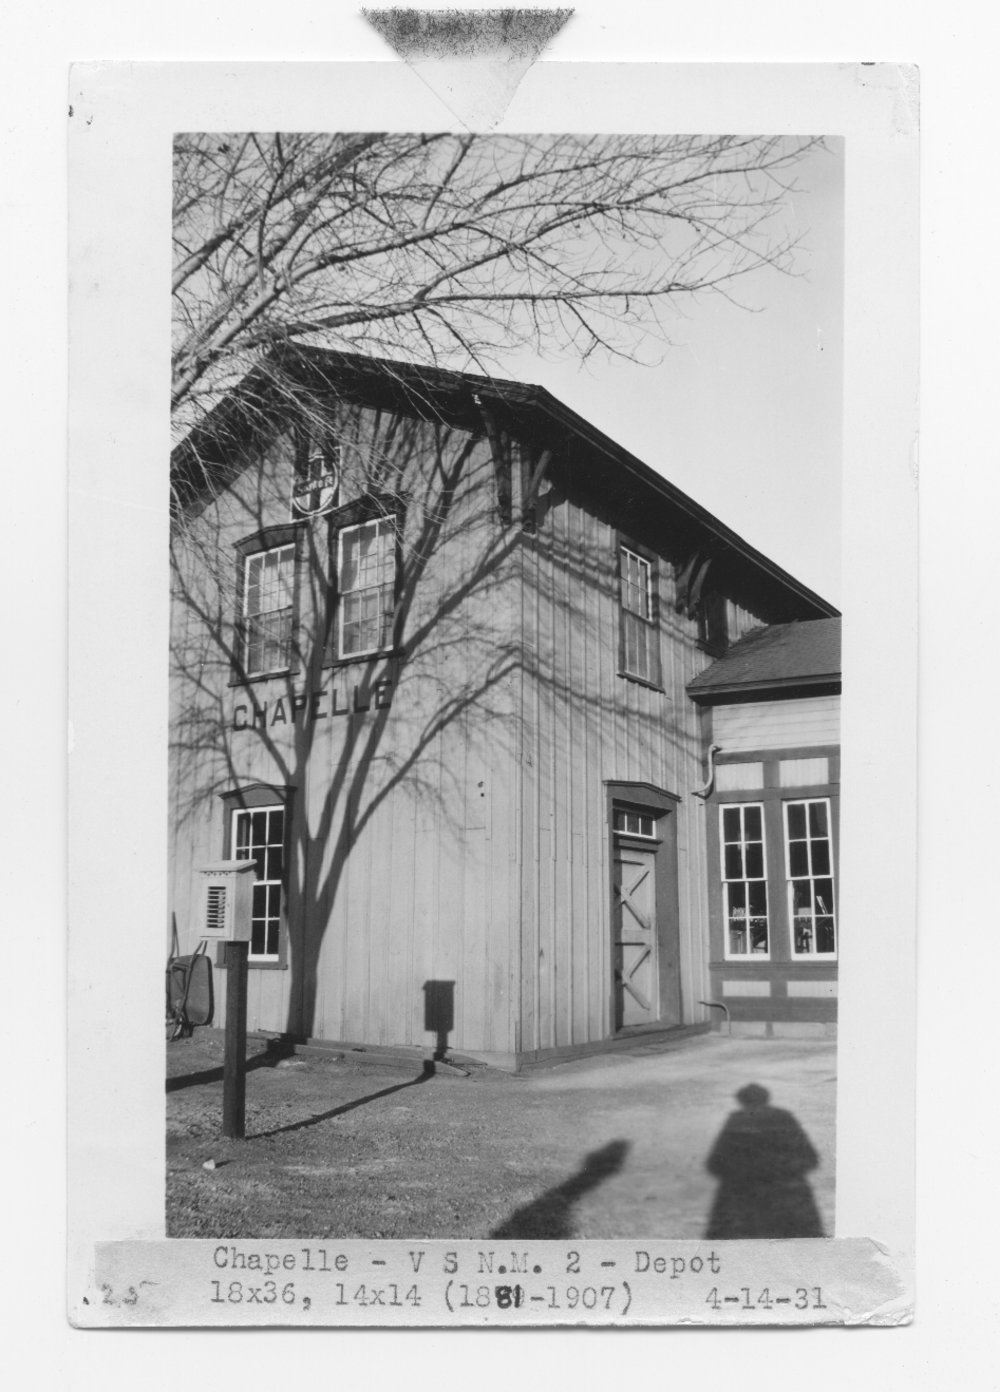 Atchison, Topeka and Santa Fe Railway Company depot, Chapelle, New Mexico